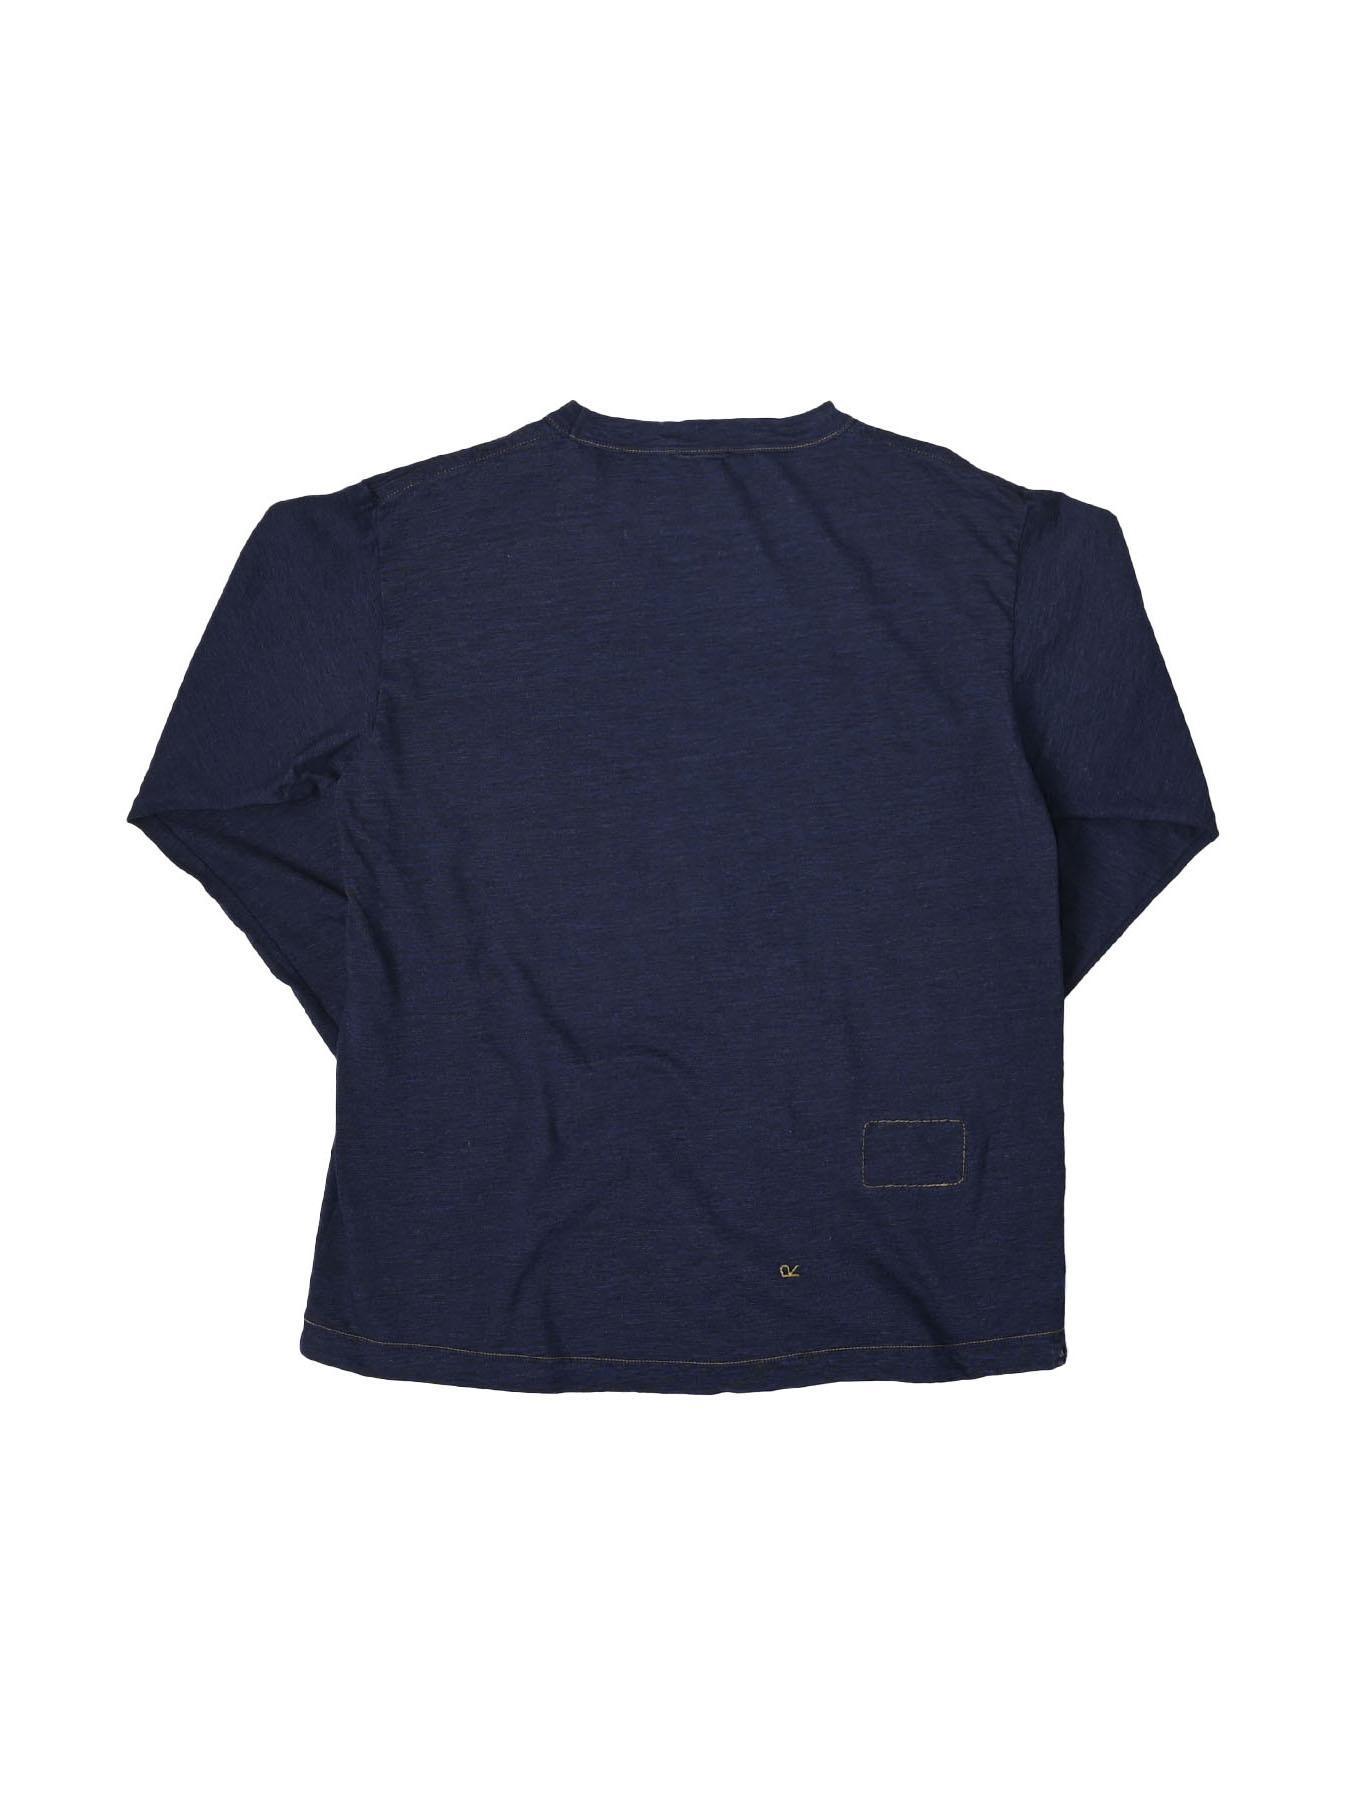 Indigo Zimbabwe 908 Ocean T-shirt-6